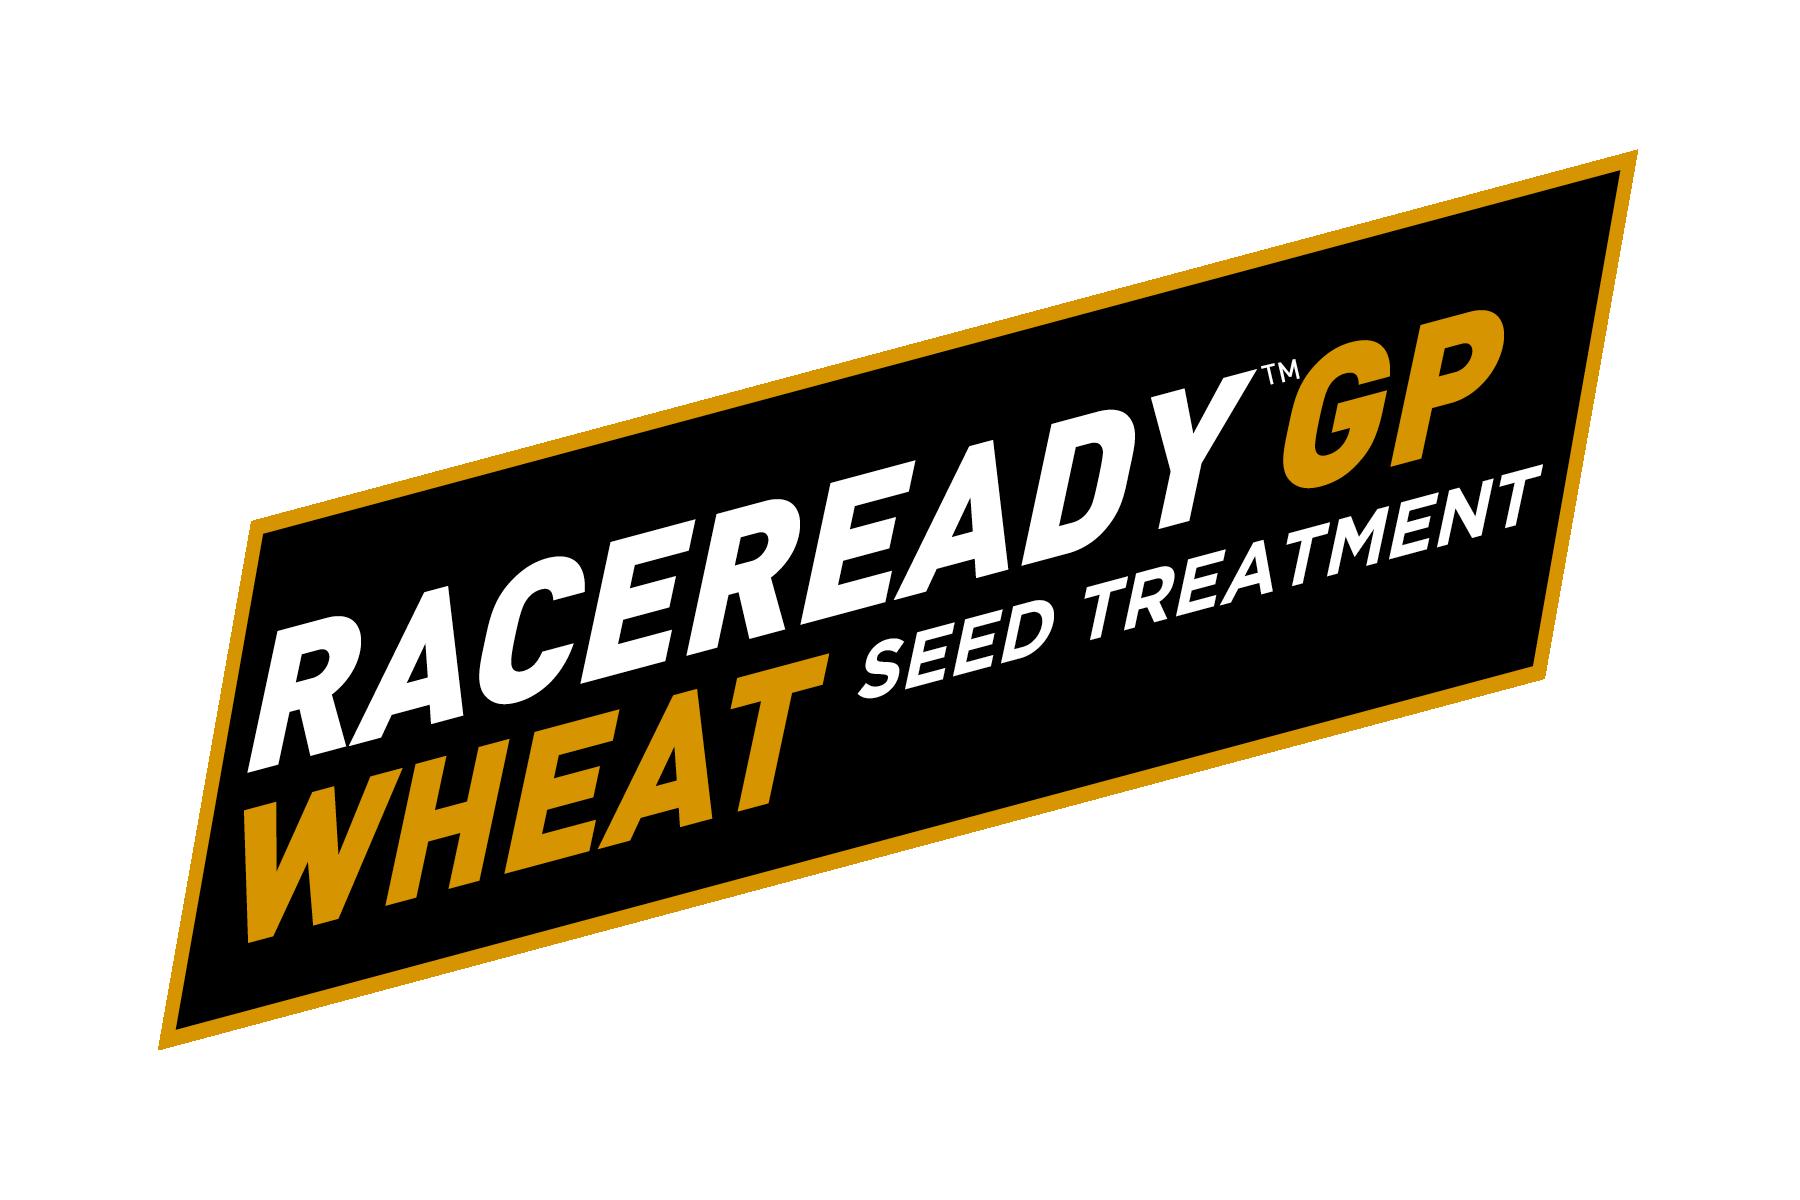 RACEREADY™ GP Wheat